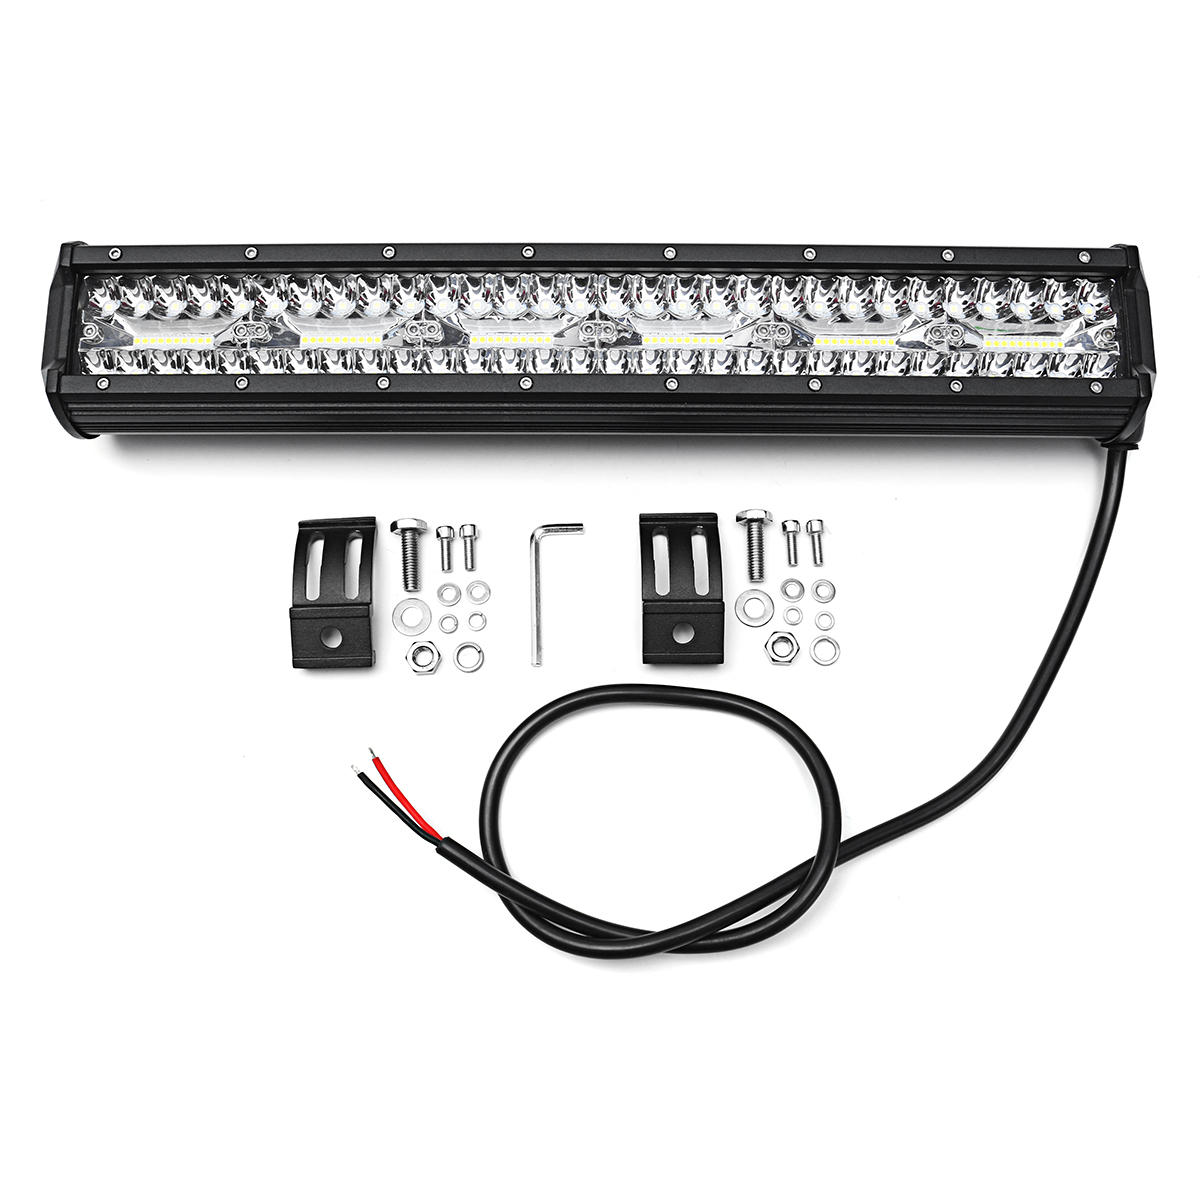 18inch 360w K Lm Ip68 120 Led Work Light Bar